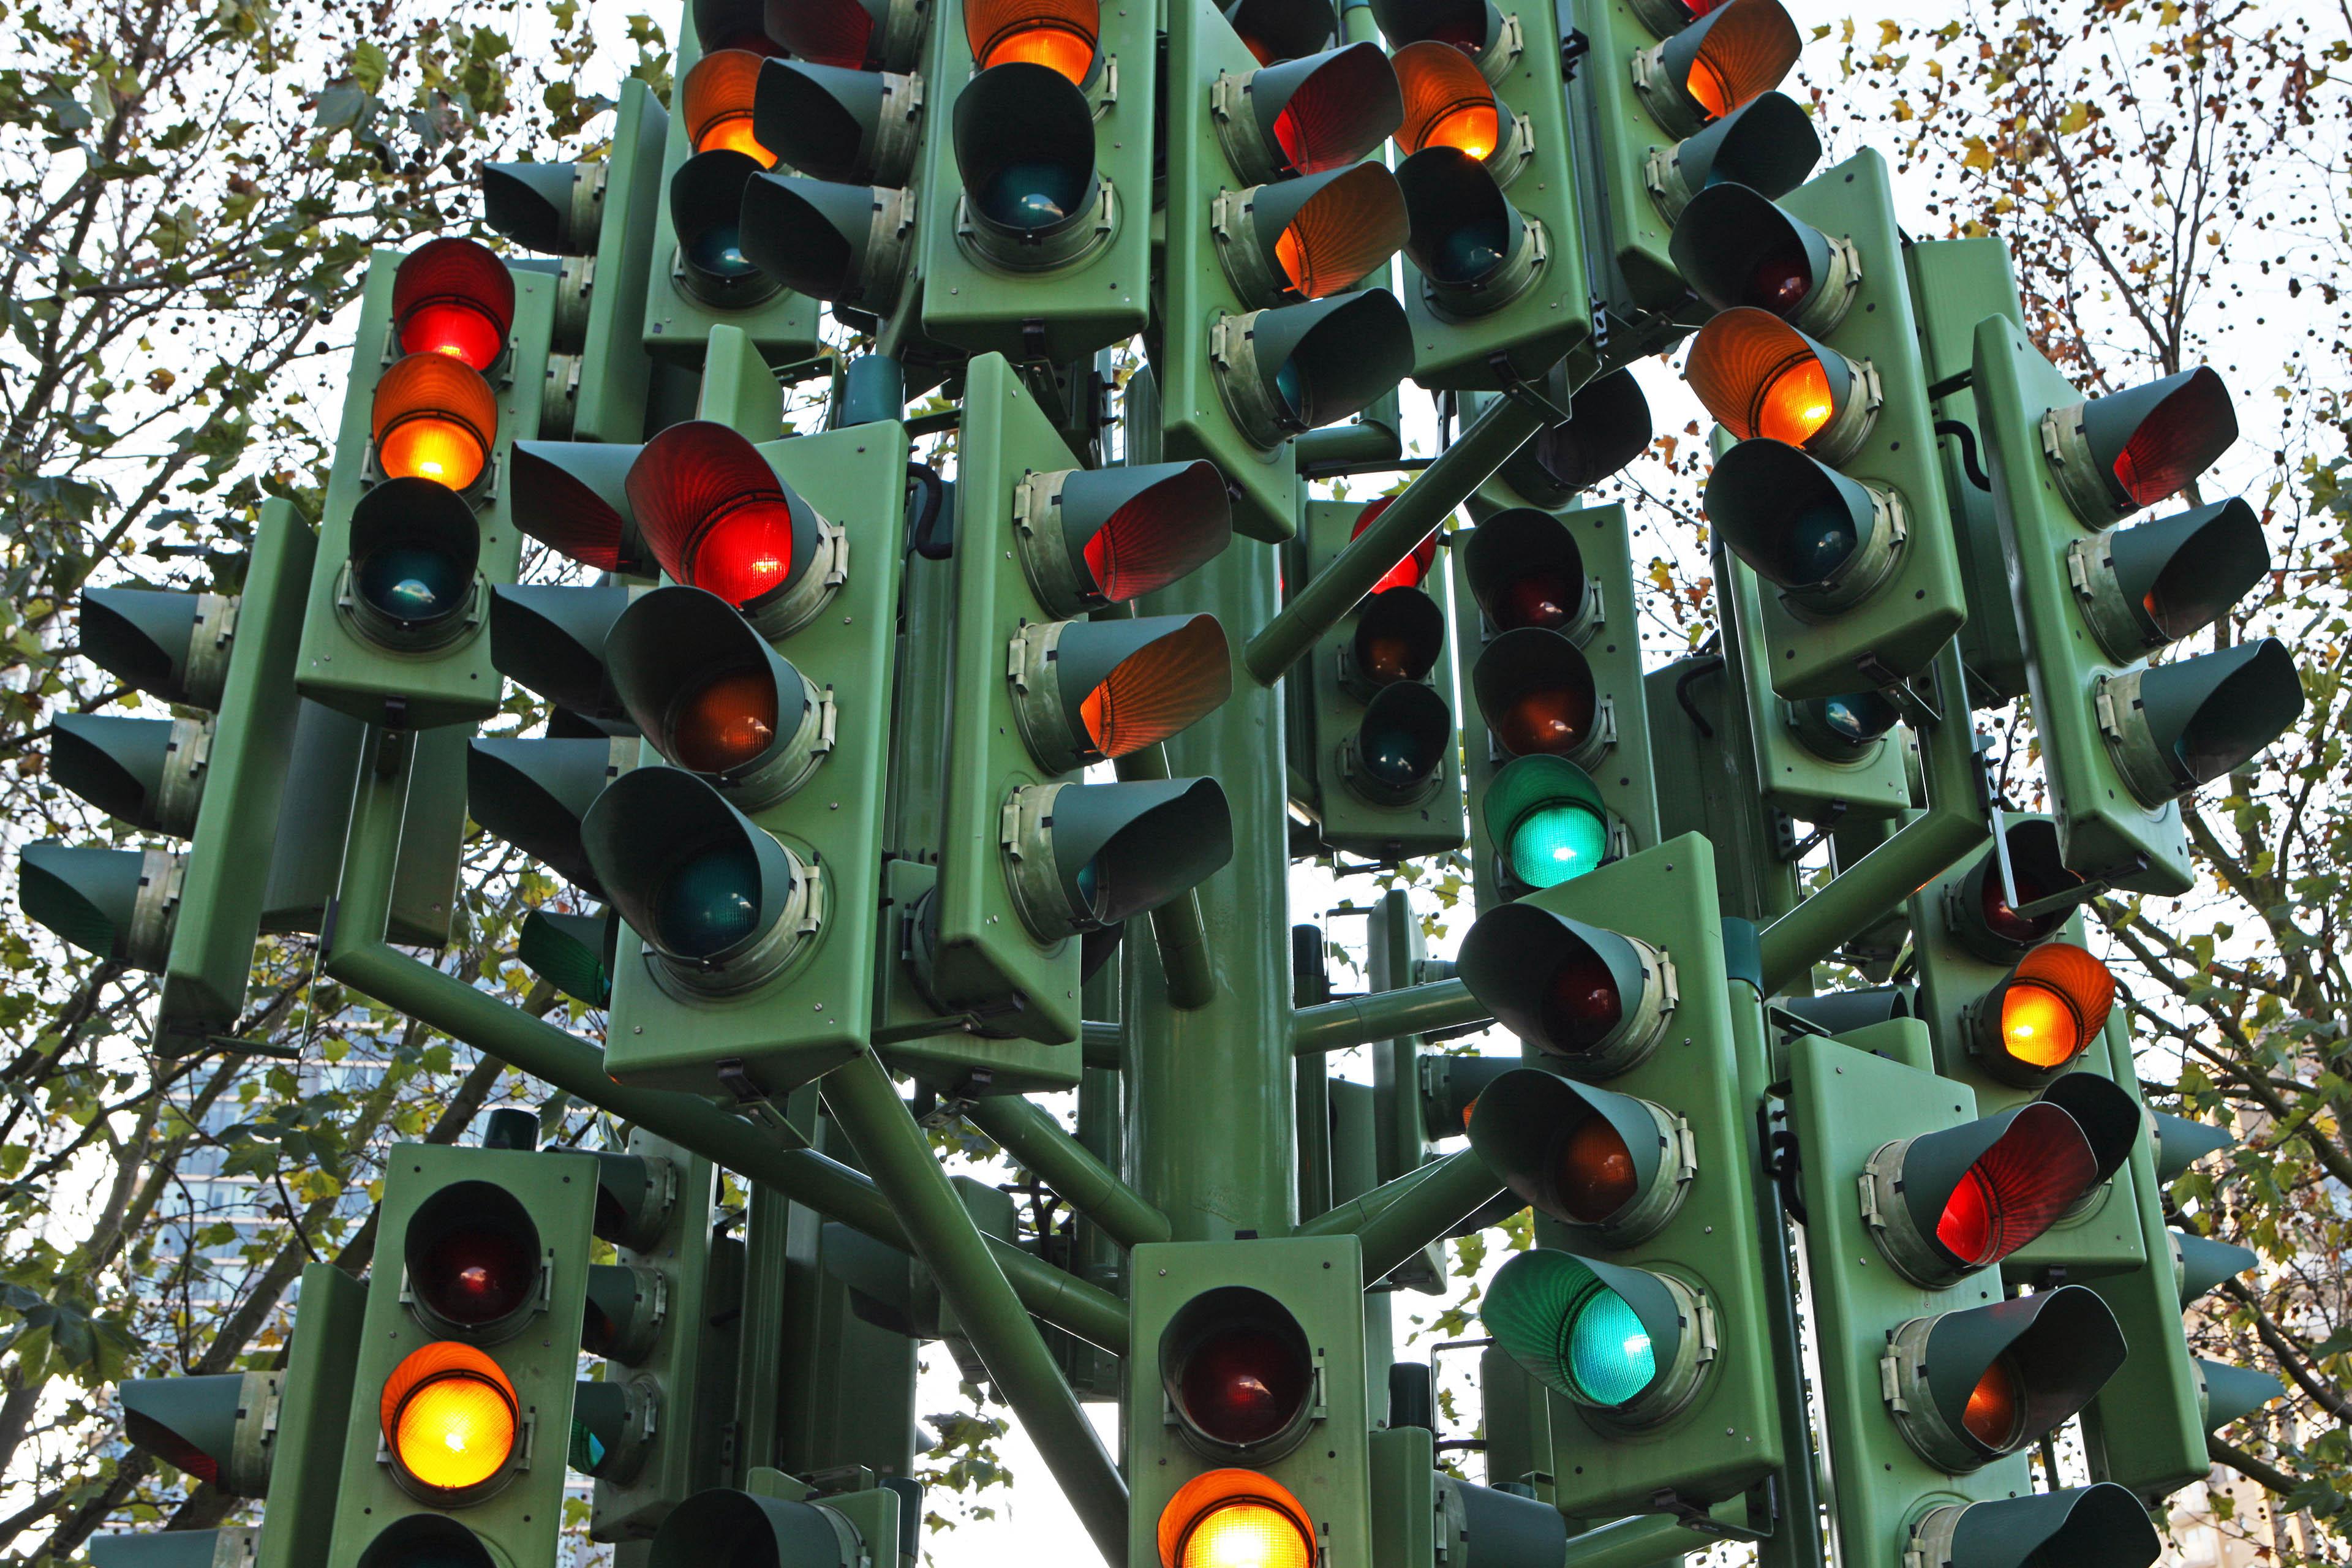 confusing traffic lights